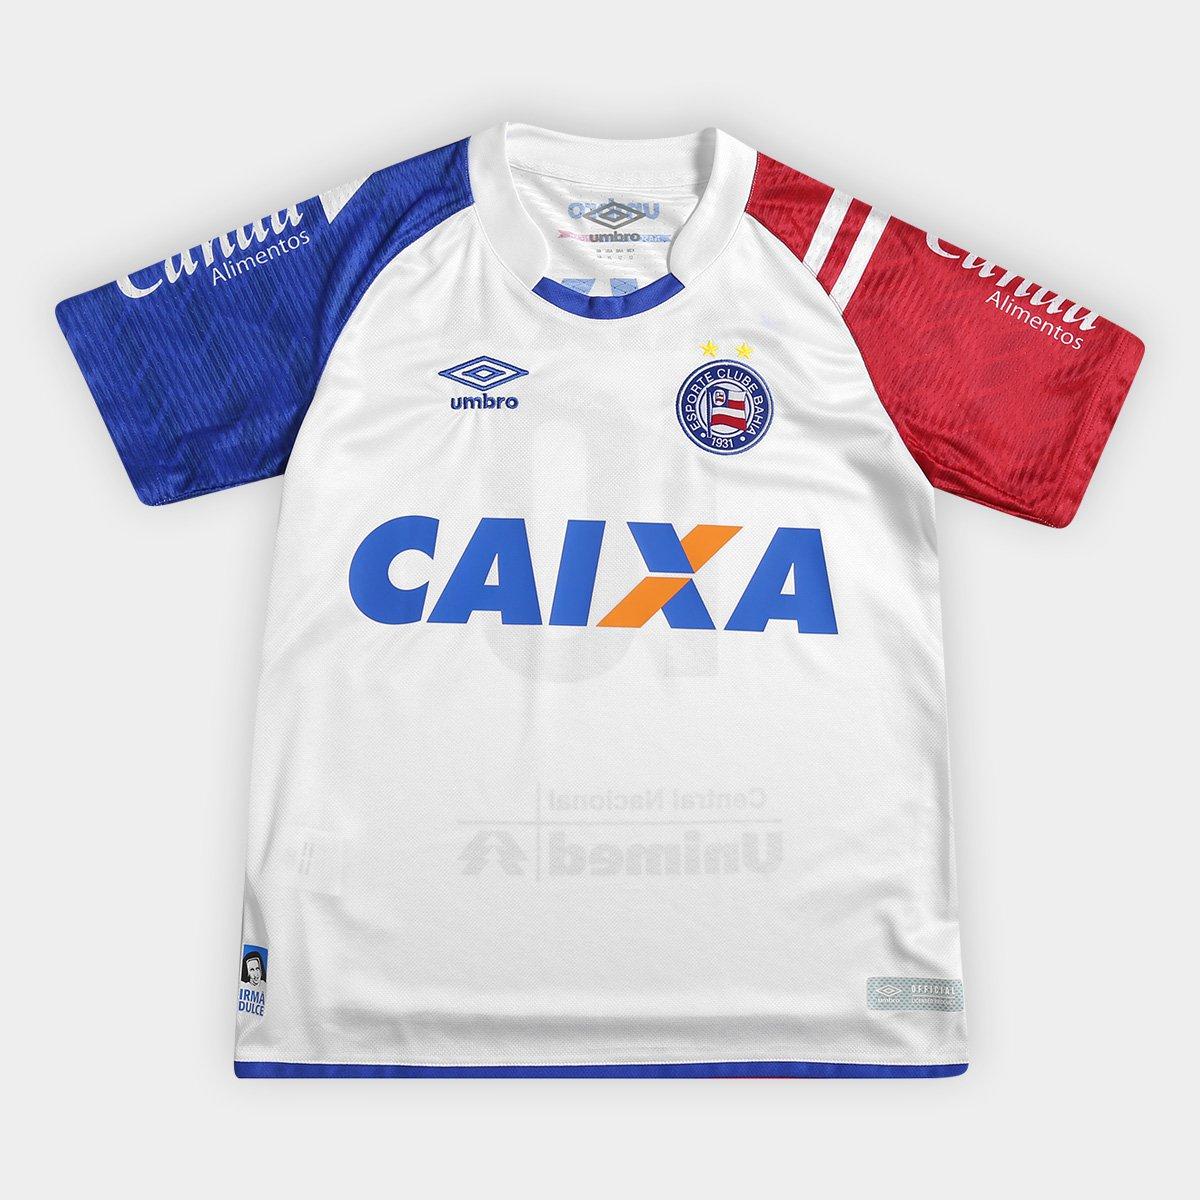 Camisa Bahia Juvenil I 17 18 nº 10 - Torcedor Umbro 0fd10f3a6685e